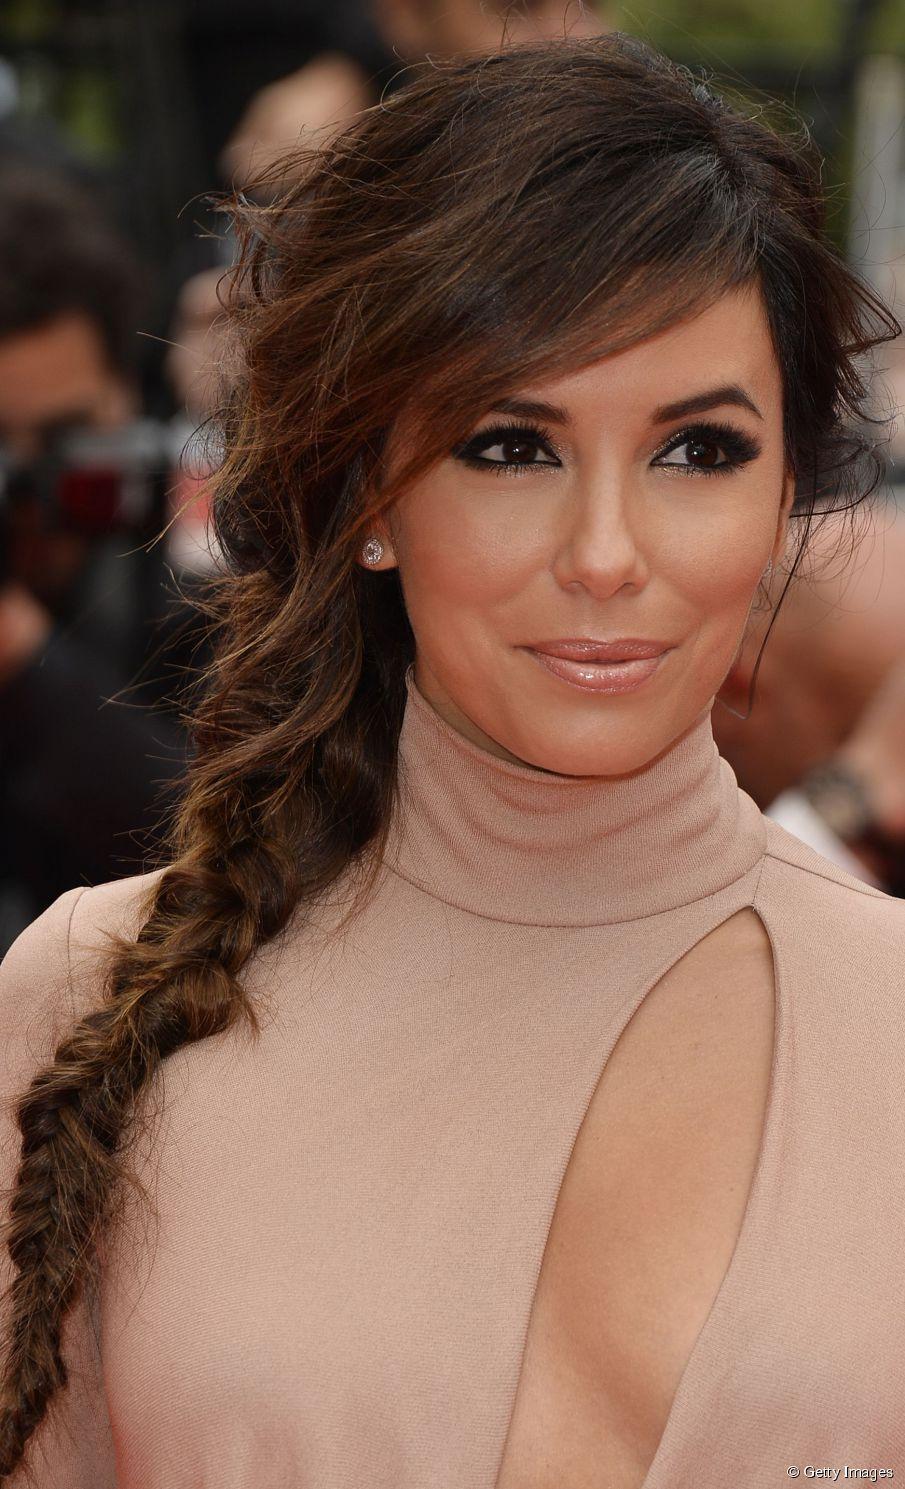 Eva Longoria Hairspiration 3 Sommerzopfe Zu Kopieren Geflochtene Frisuren Wellige Frisuren Coole Frisuren